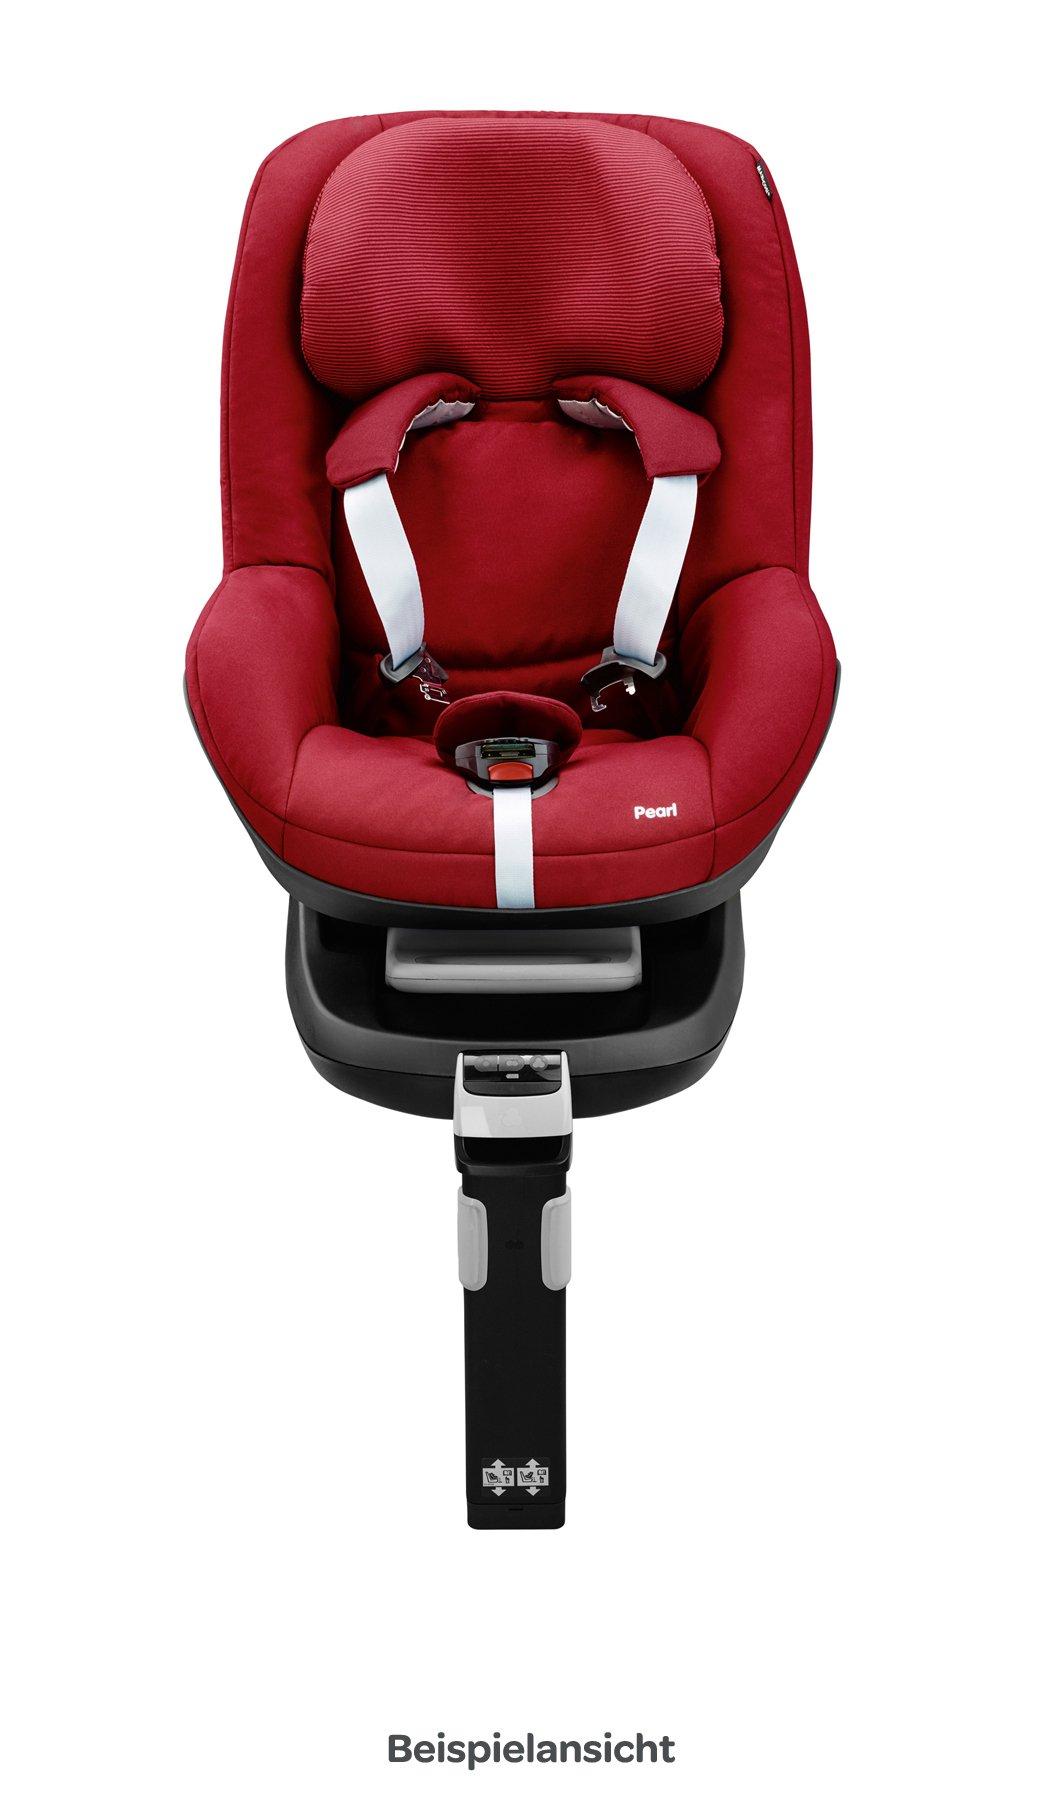 Maxi-Cosi 63409641Pearl Children's Seat, Group 1, 9-18kg Maxi-Cosi  16